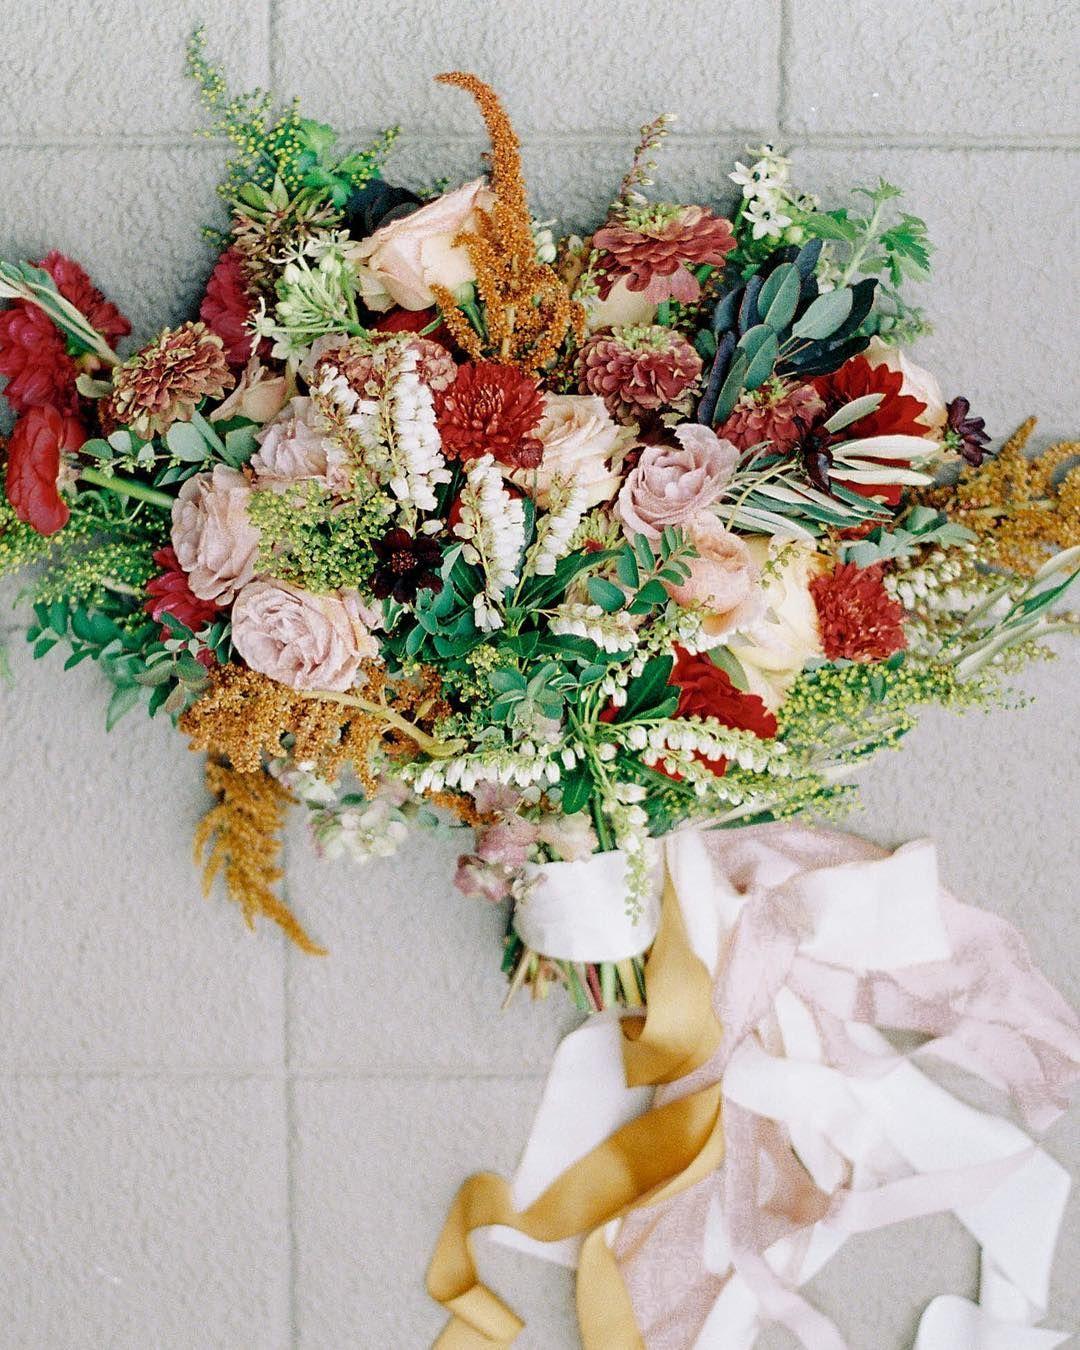 Seattle Wedding Florist On Instagram Textural Autumn Bouquet With